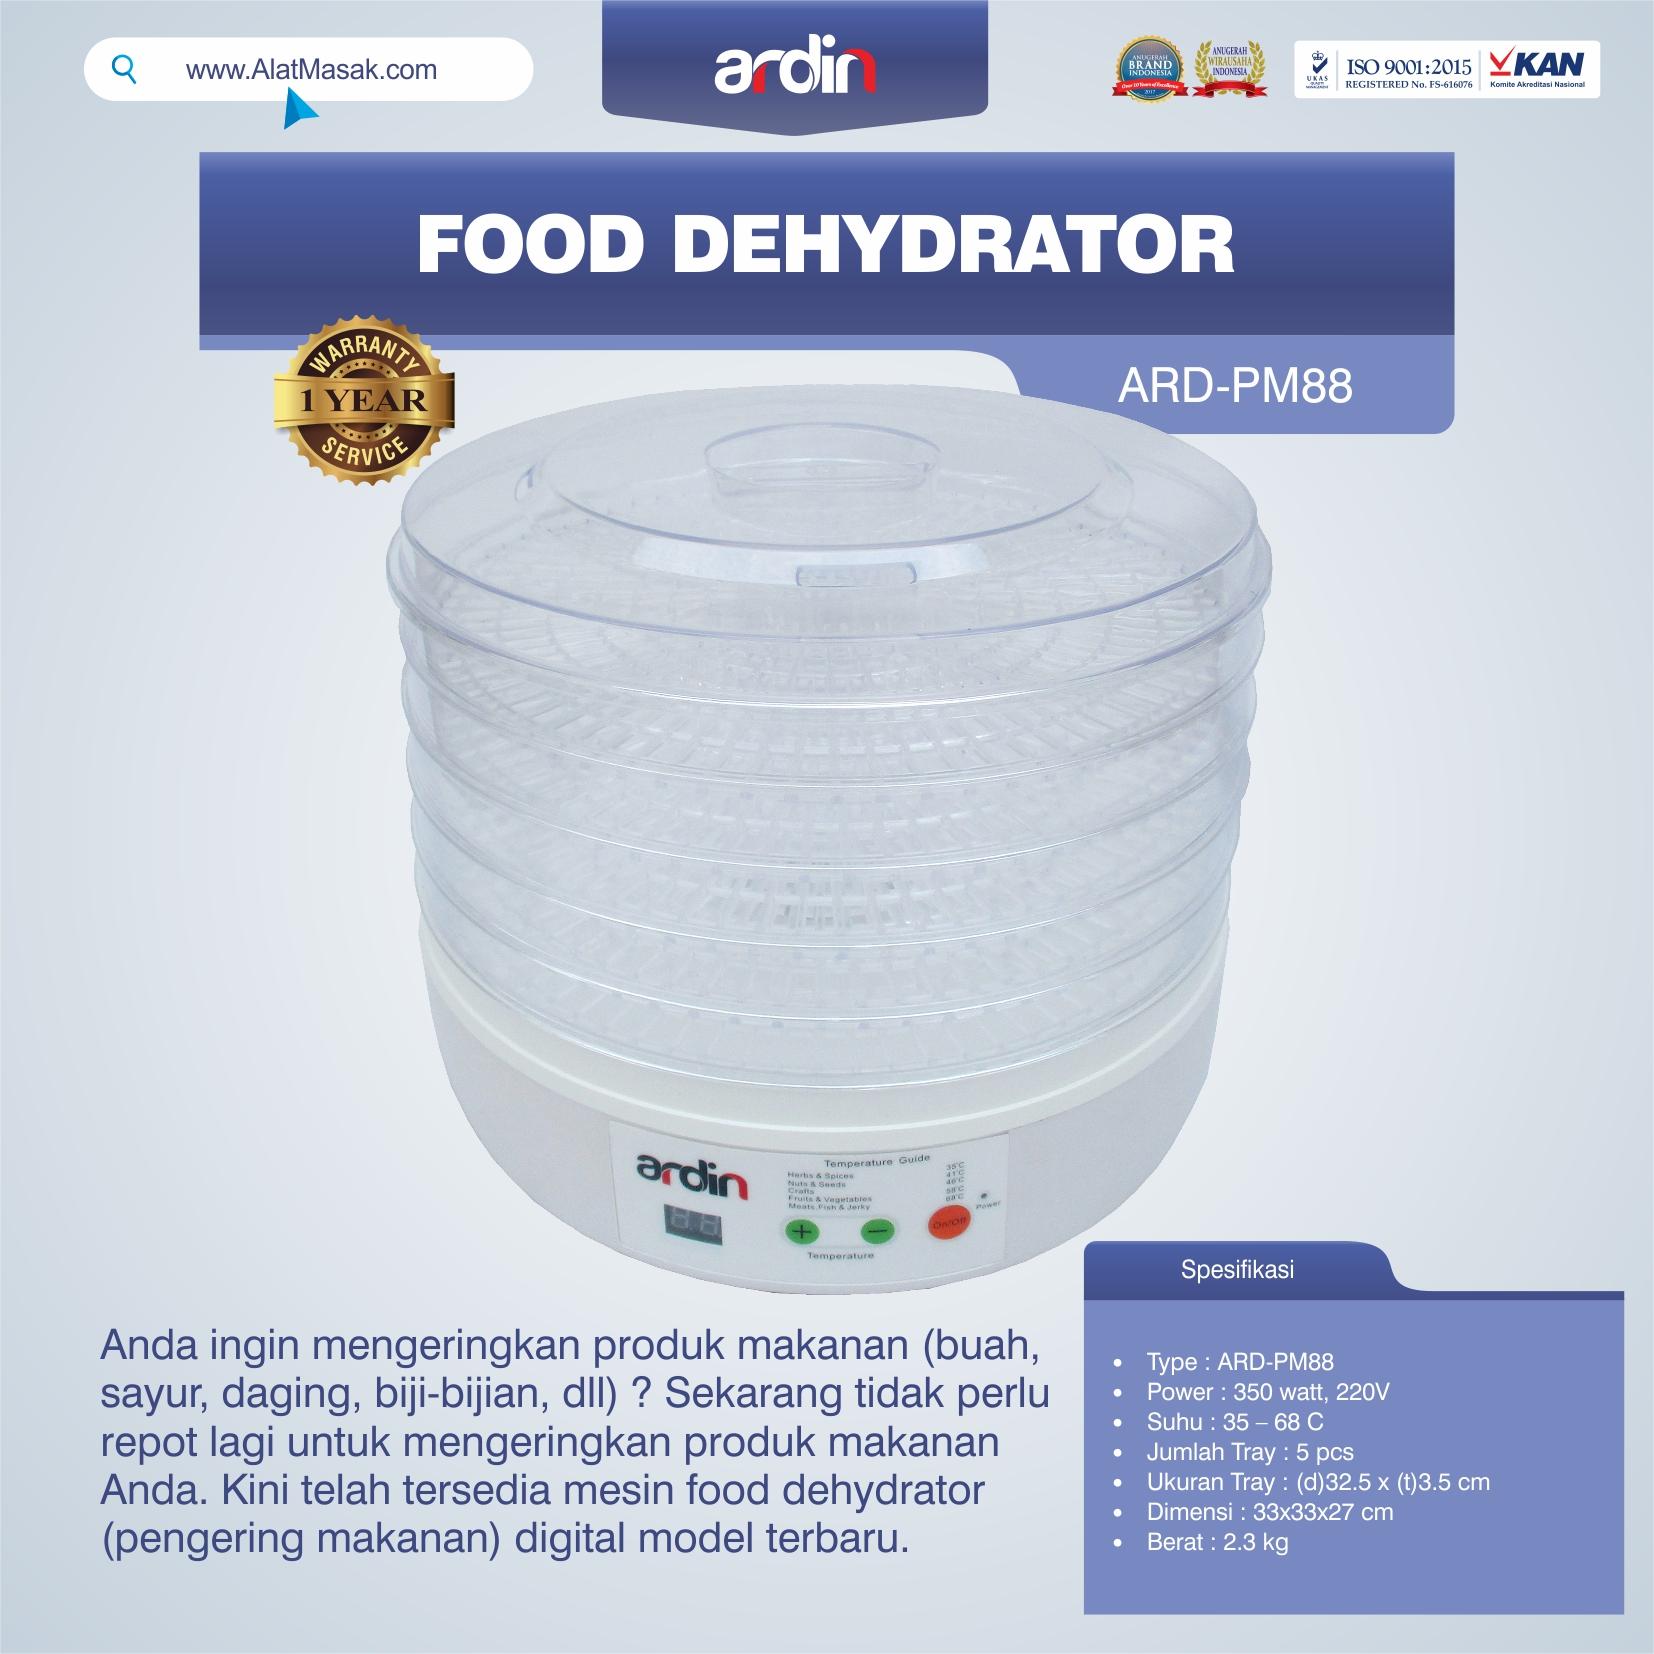 Jual Food Dehydrator ARD-PM88 di Blitar